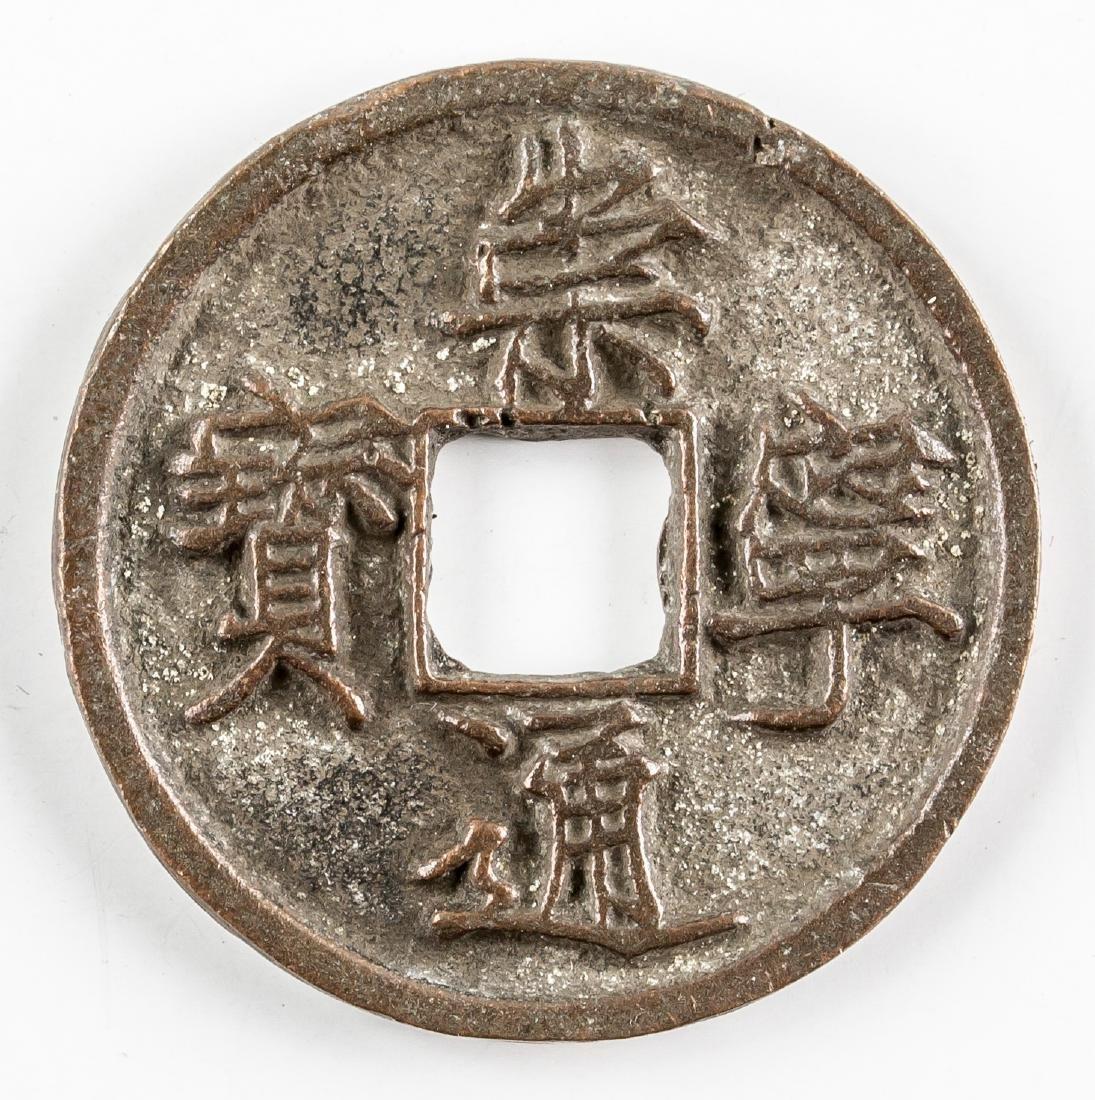 1101-1125 China Chongning Tongbao 10 Cash H16.400